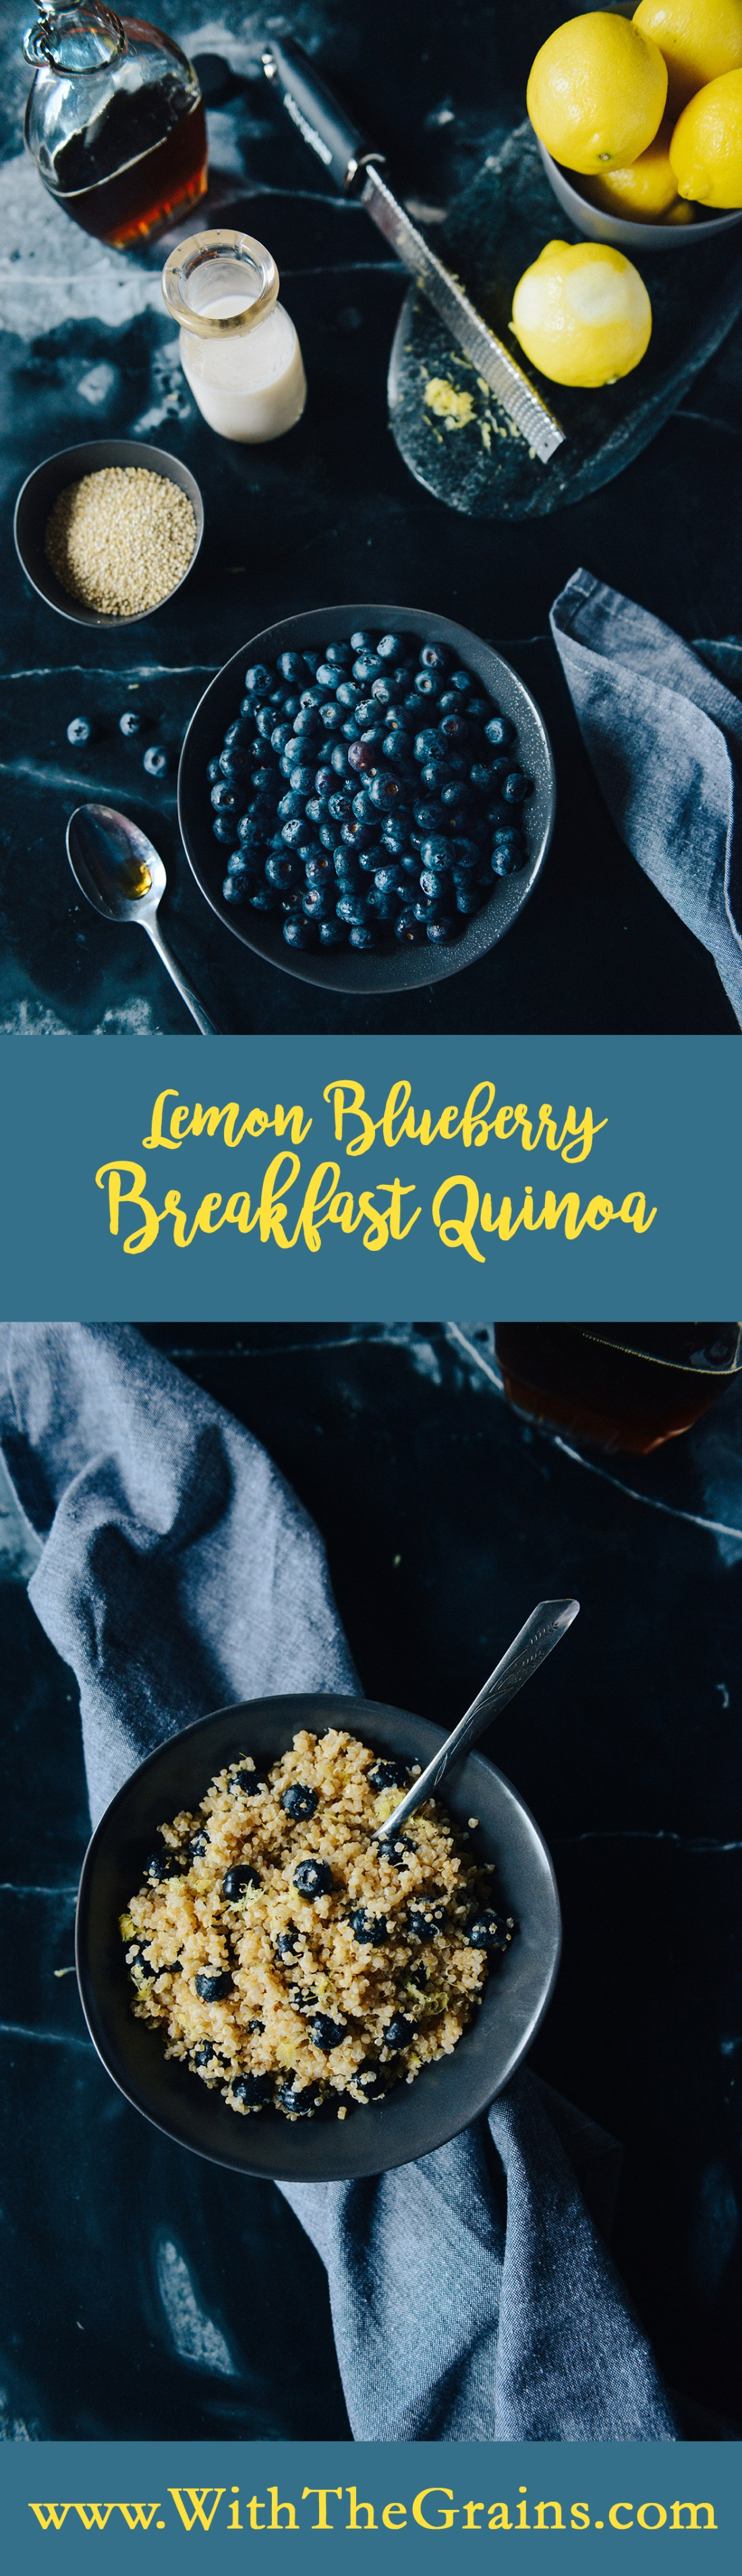 Lemon Blueberry Breakfast Quinoa // www.WithTheGrains.com